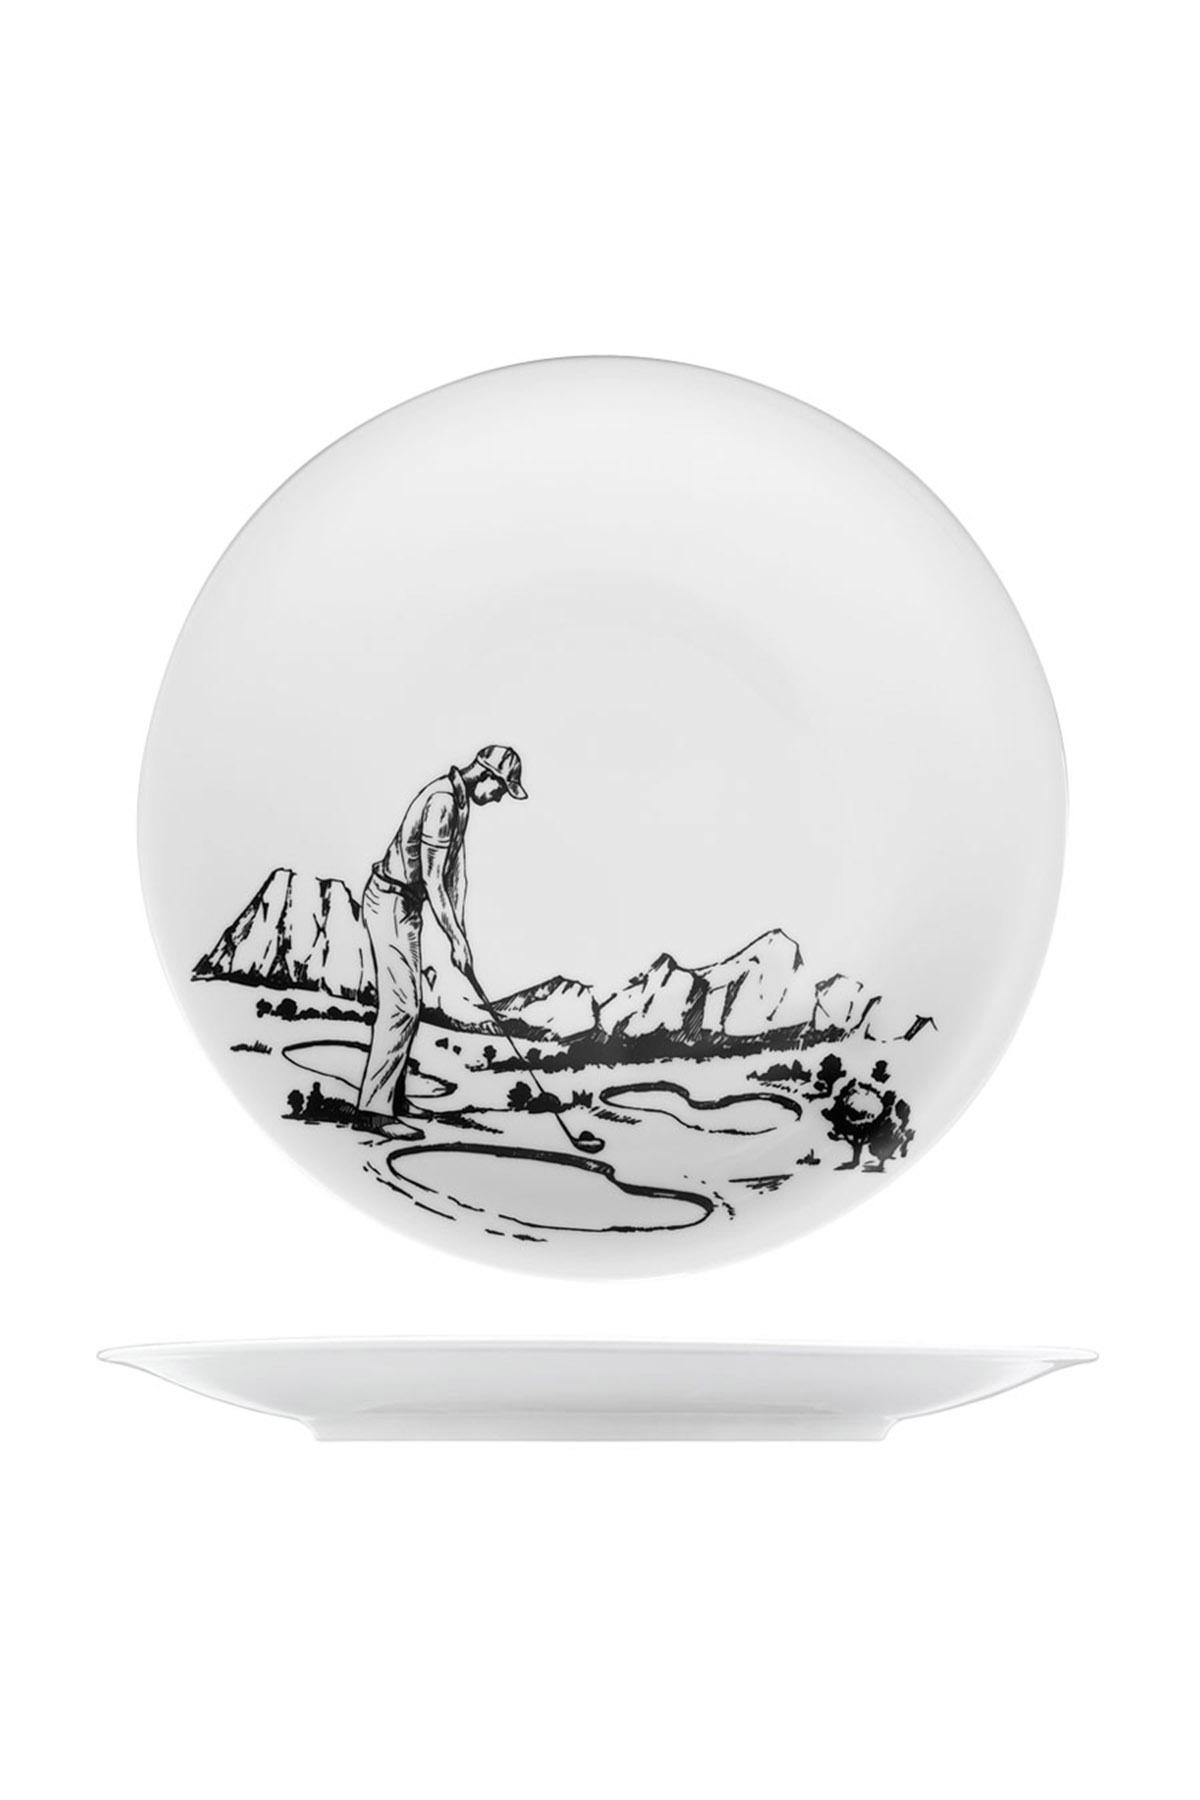 KÜTAHYA PORSELEN - Kütahya Porselen Centilmen Serisi Servis Tabağı Golf